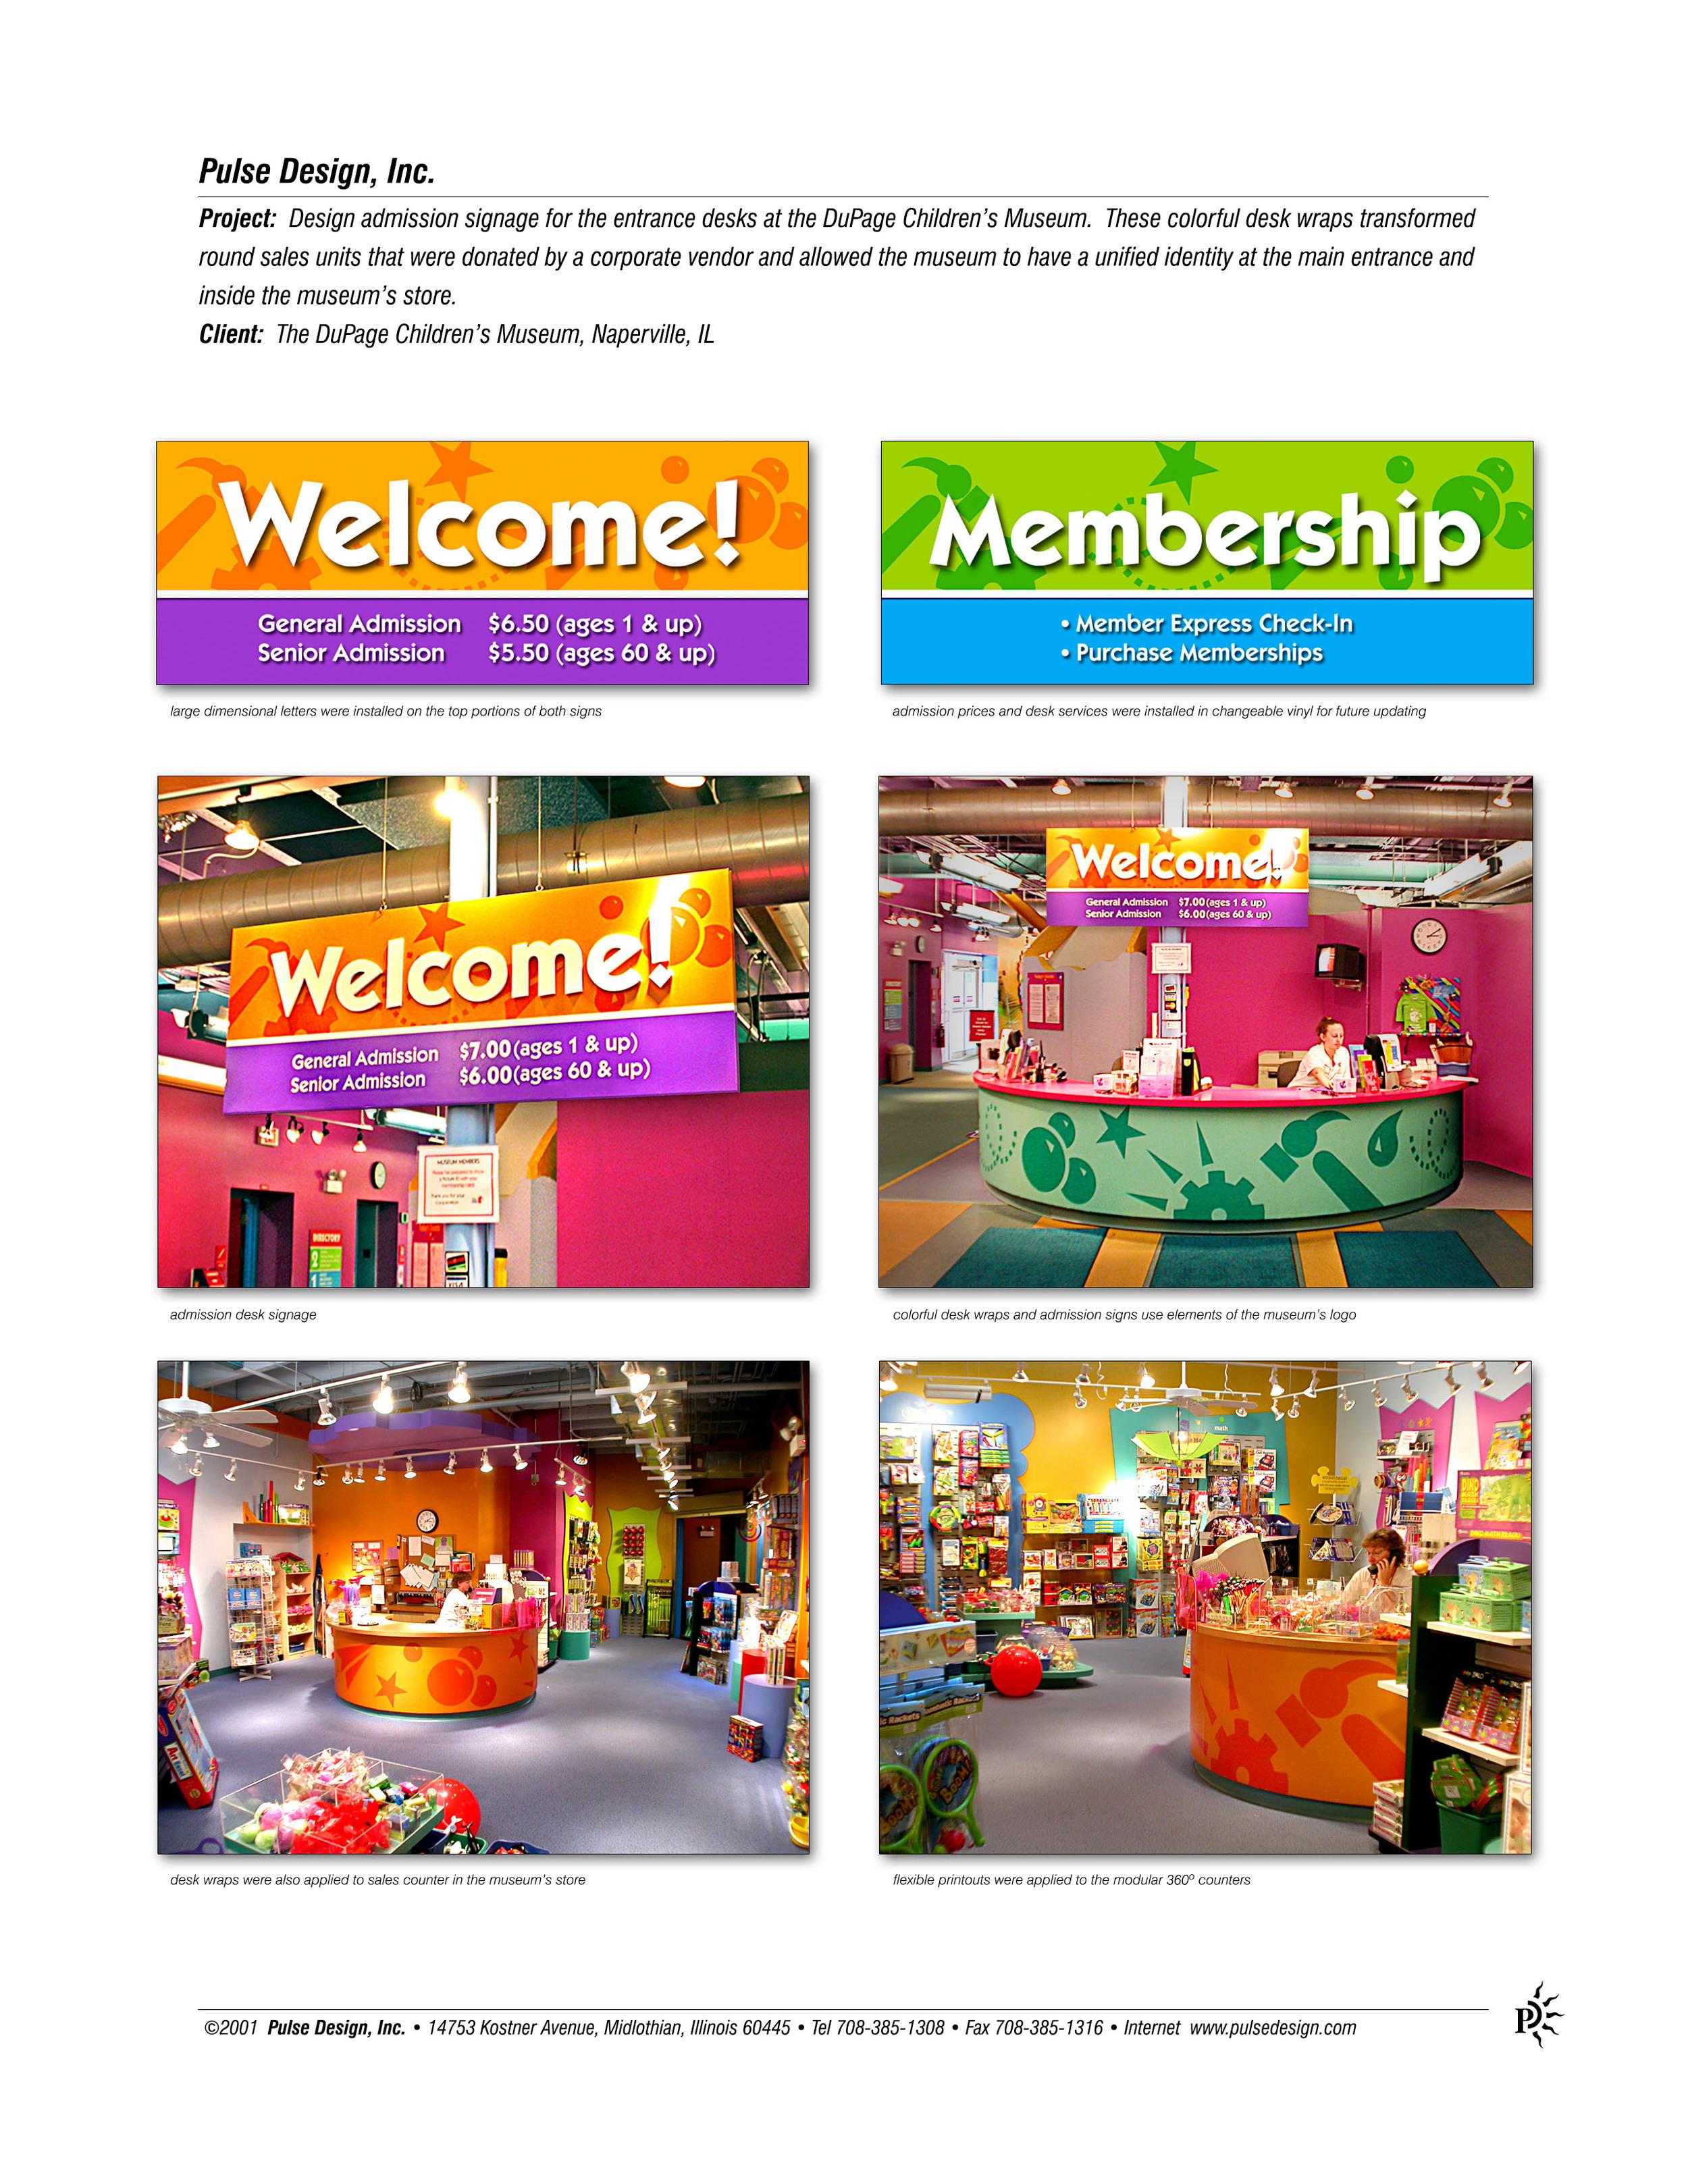 DCM-Entry-Desks-Pulse-Design-Inc.jpg